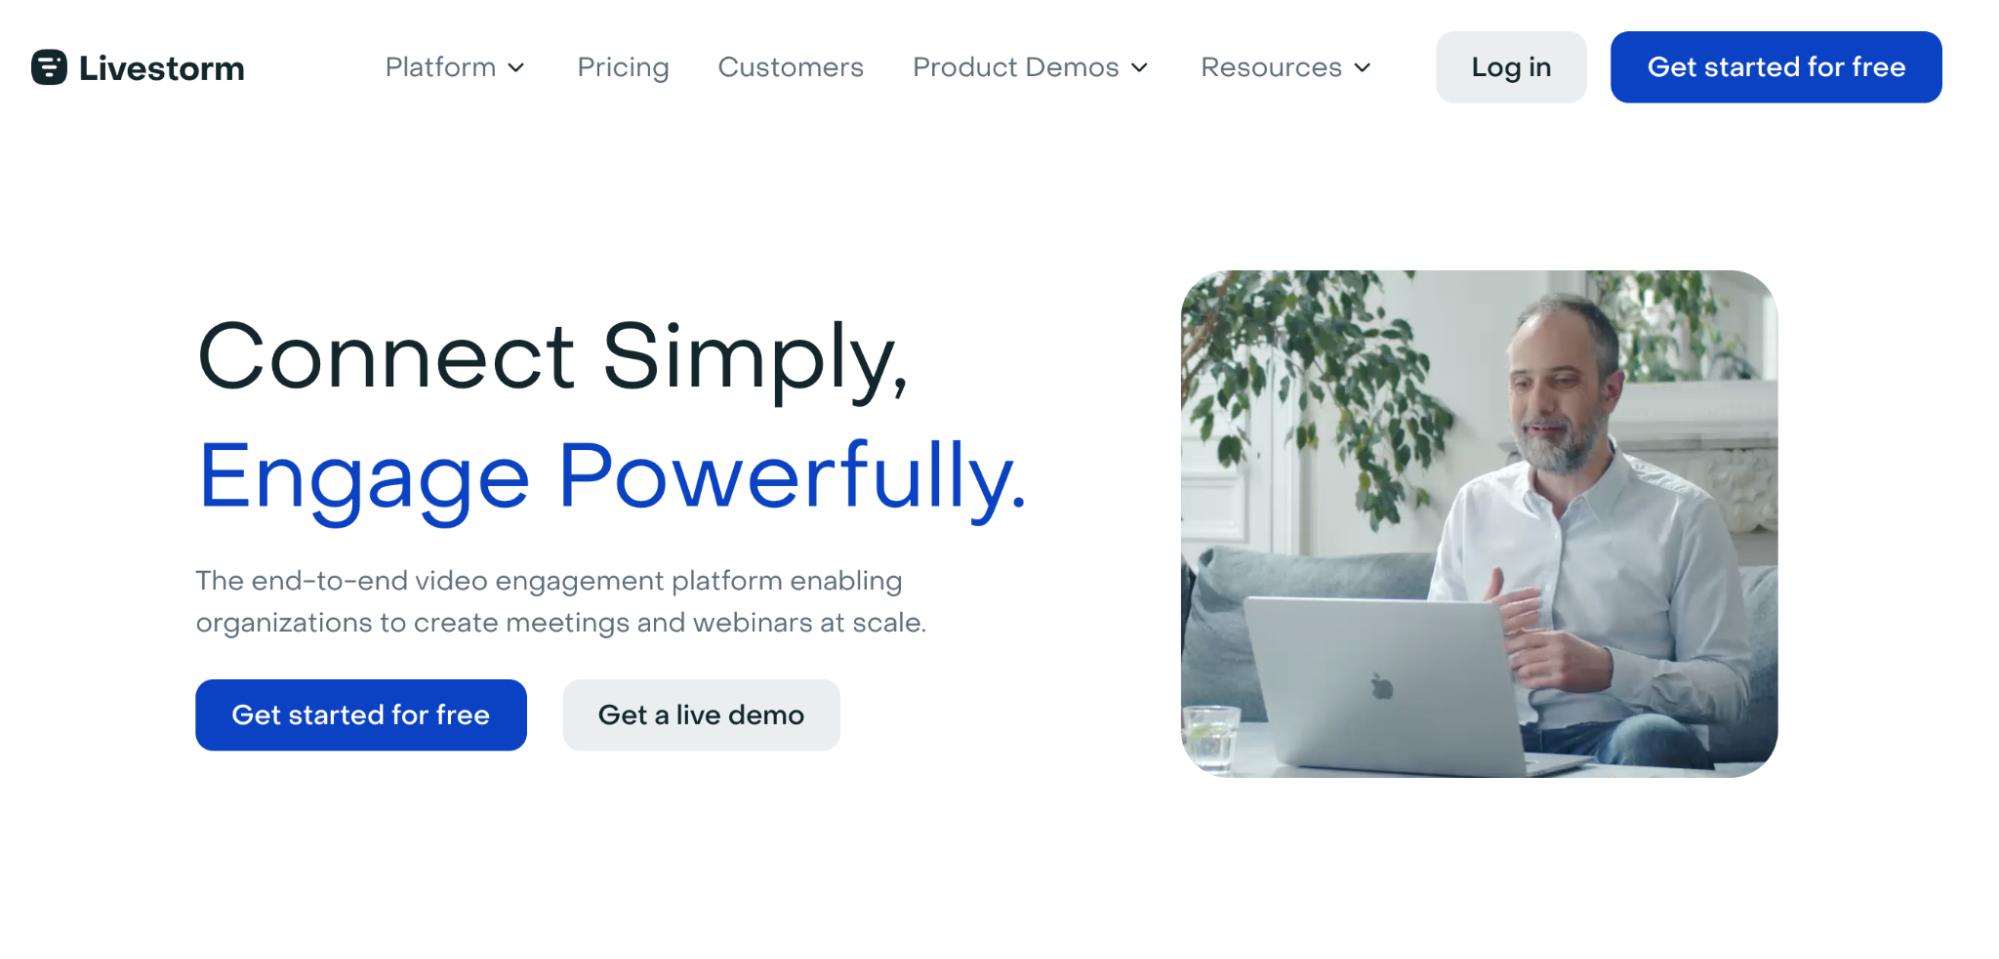 SaaS Marketing Automation Tools: Livestorm Screenshot